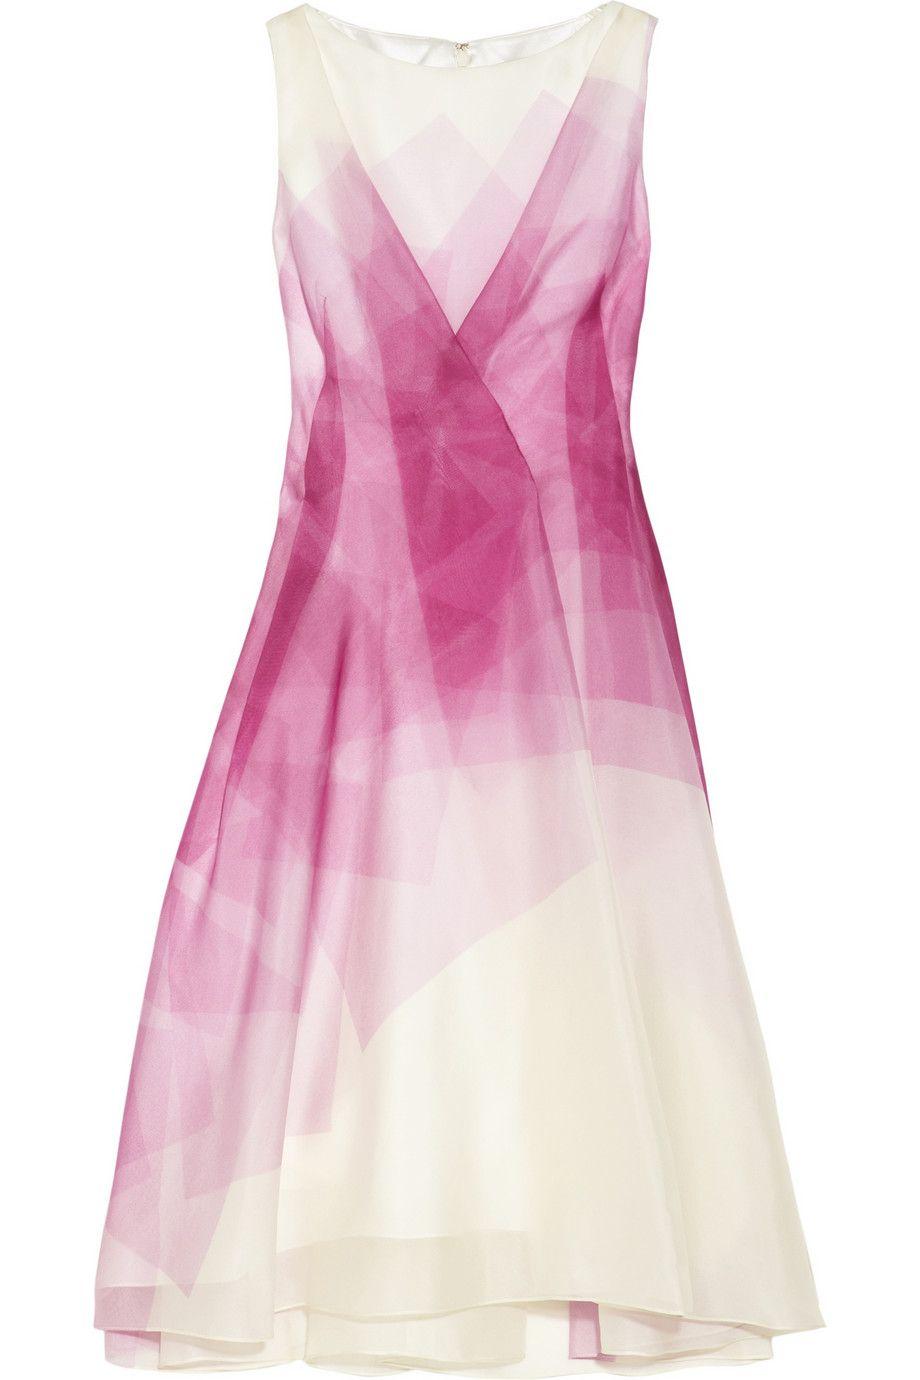 Lela Rose | Printed silk-organza dress | NET-A-PORTER.COM | My style ...